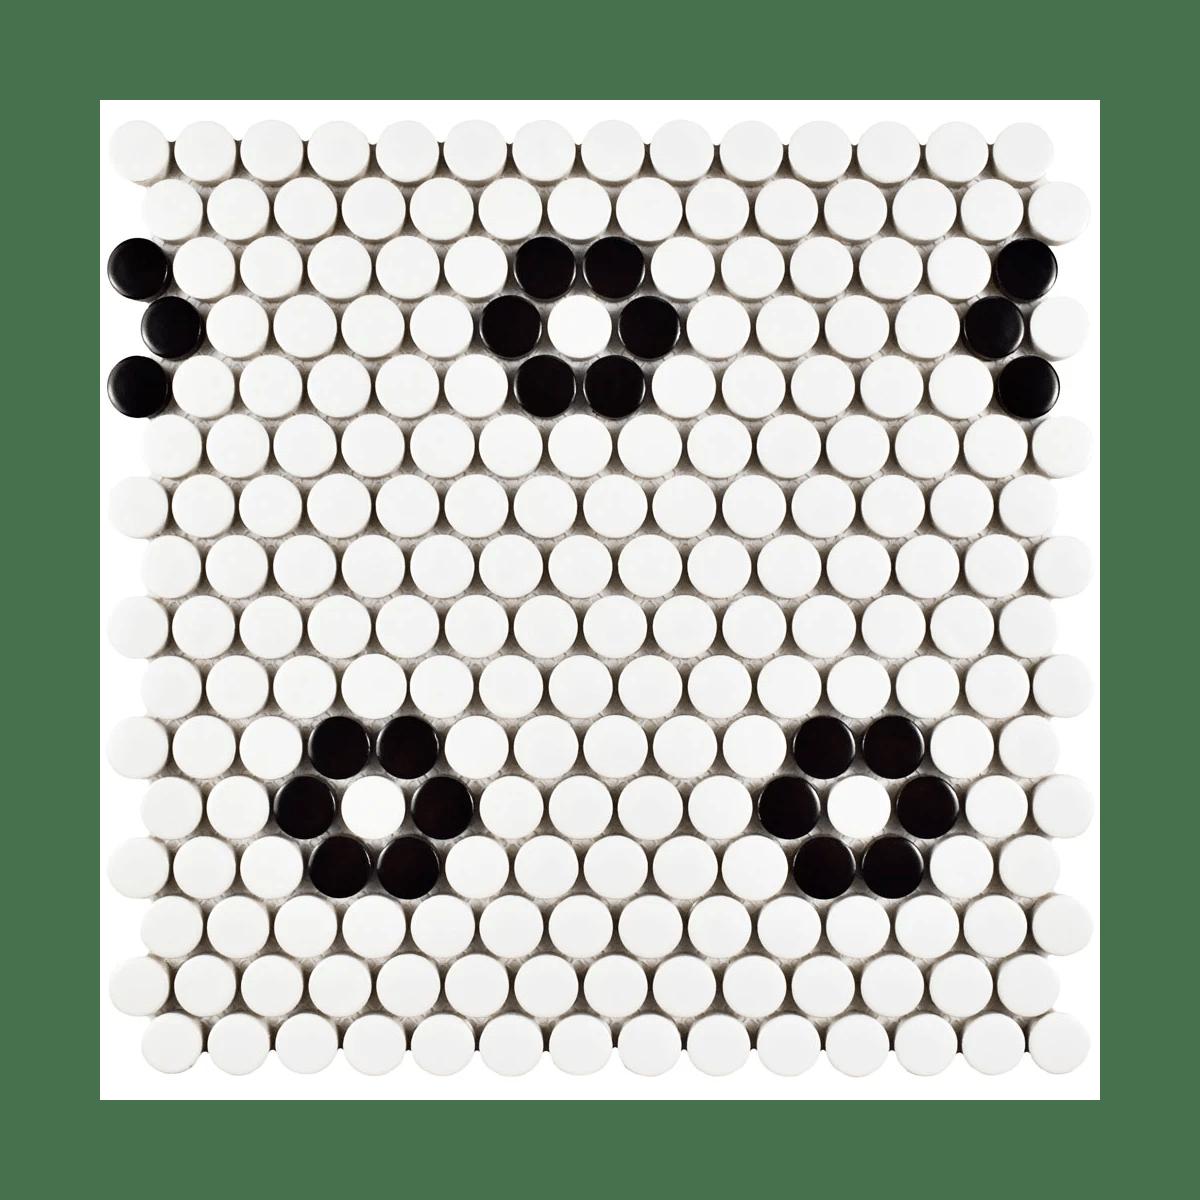 affinity tile fdxmpmhf sample